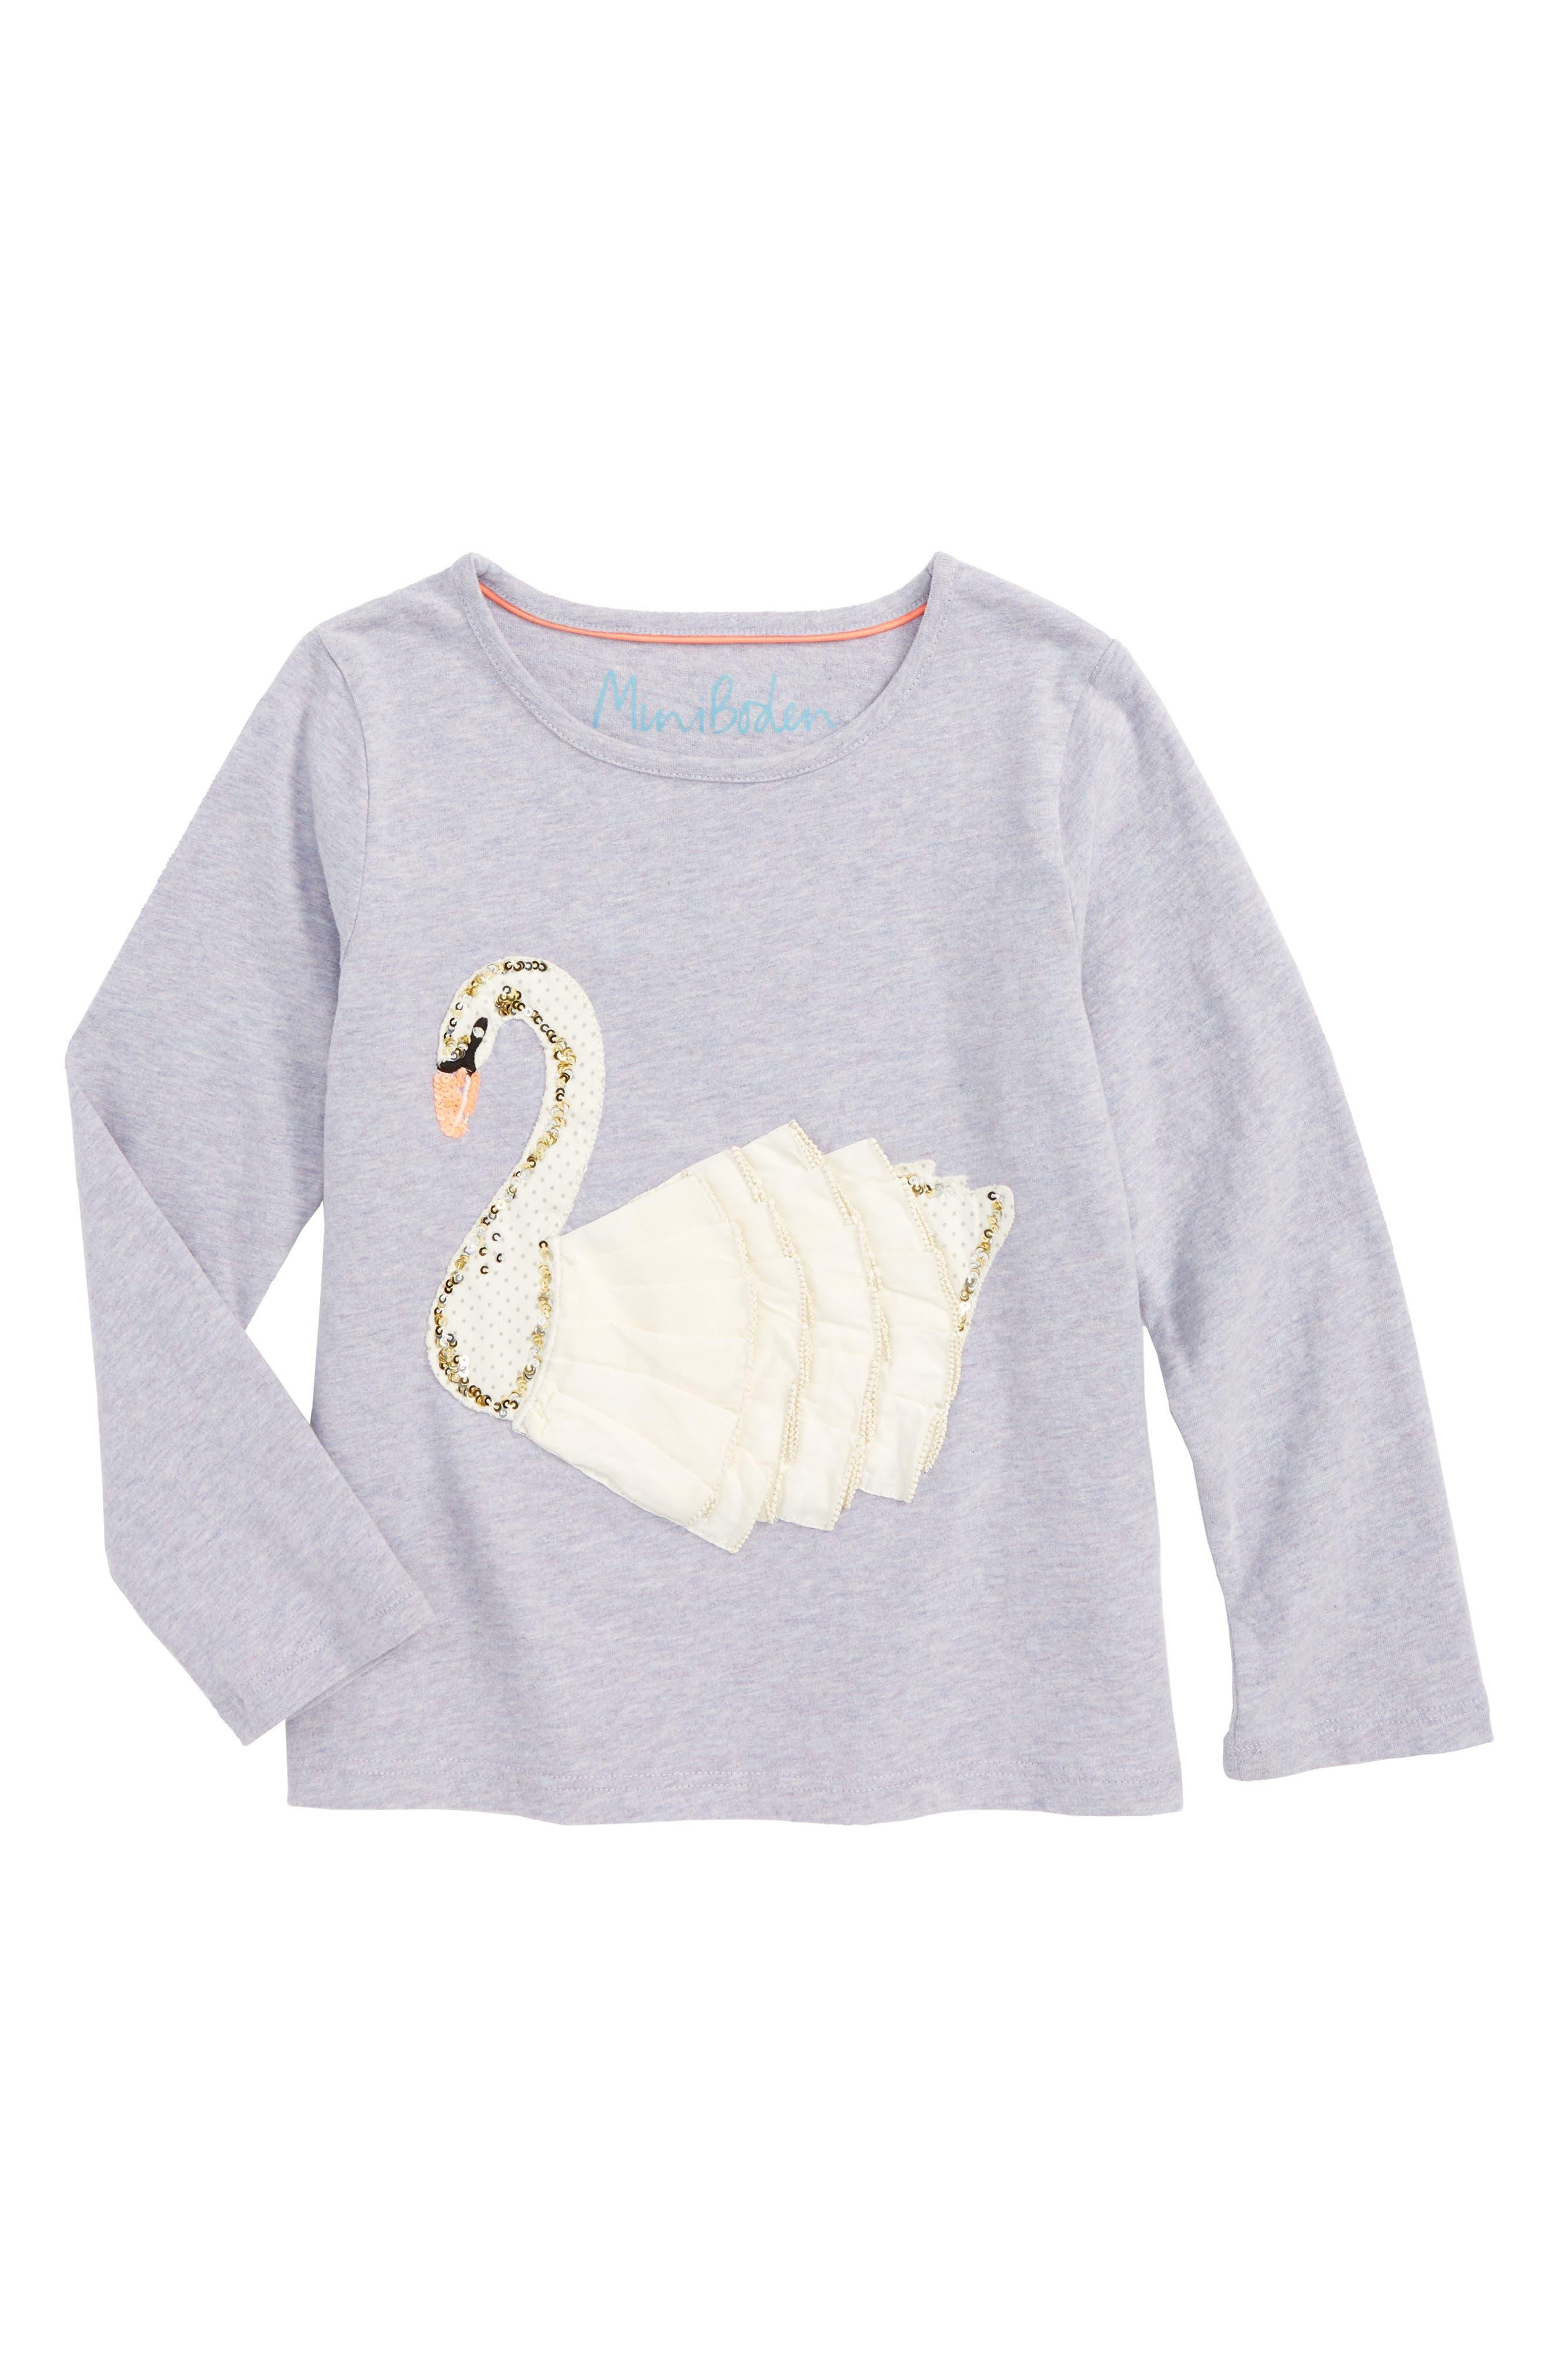 Fairytale Sequin Tee,                         Main,                         color, Lavender Grey Swan Lgy